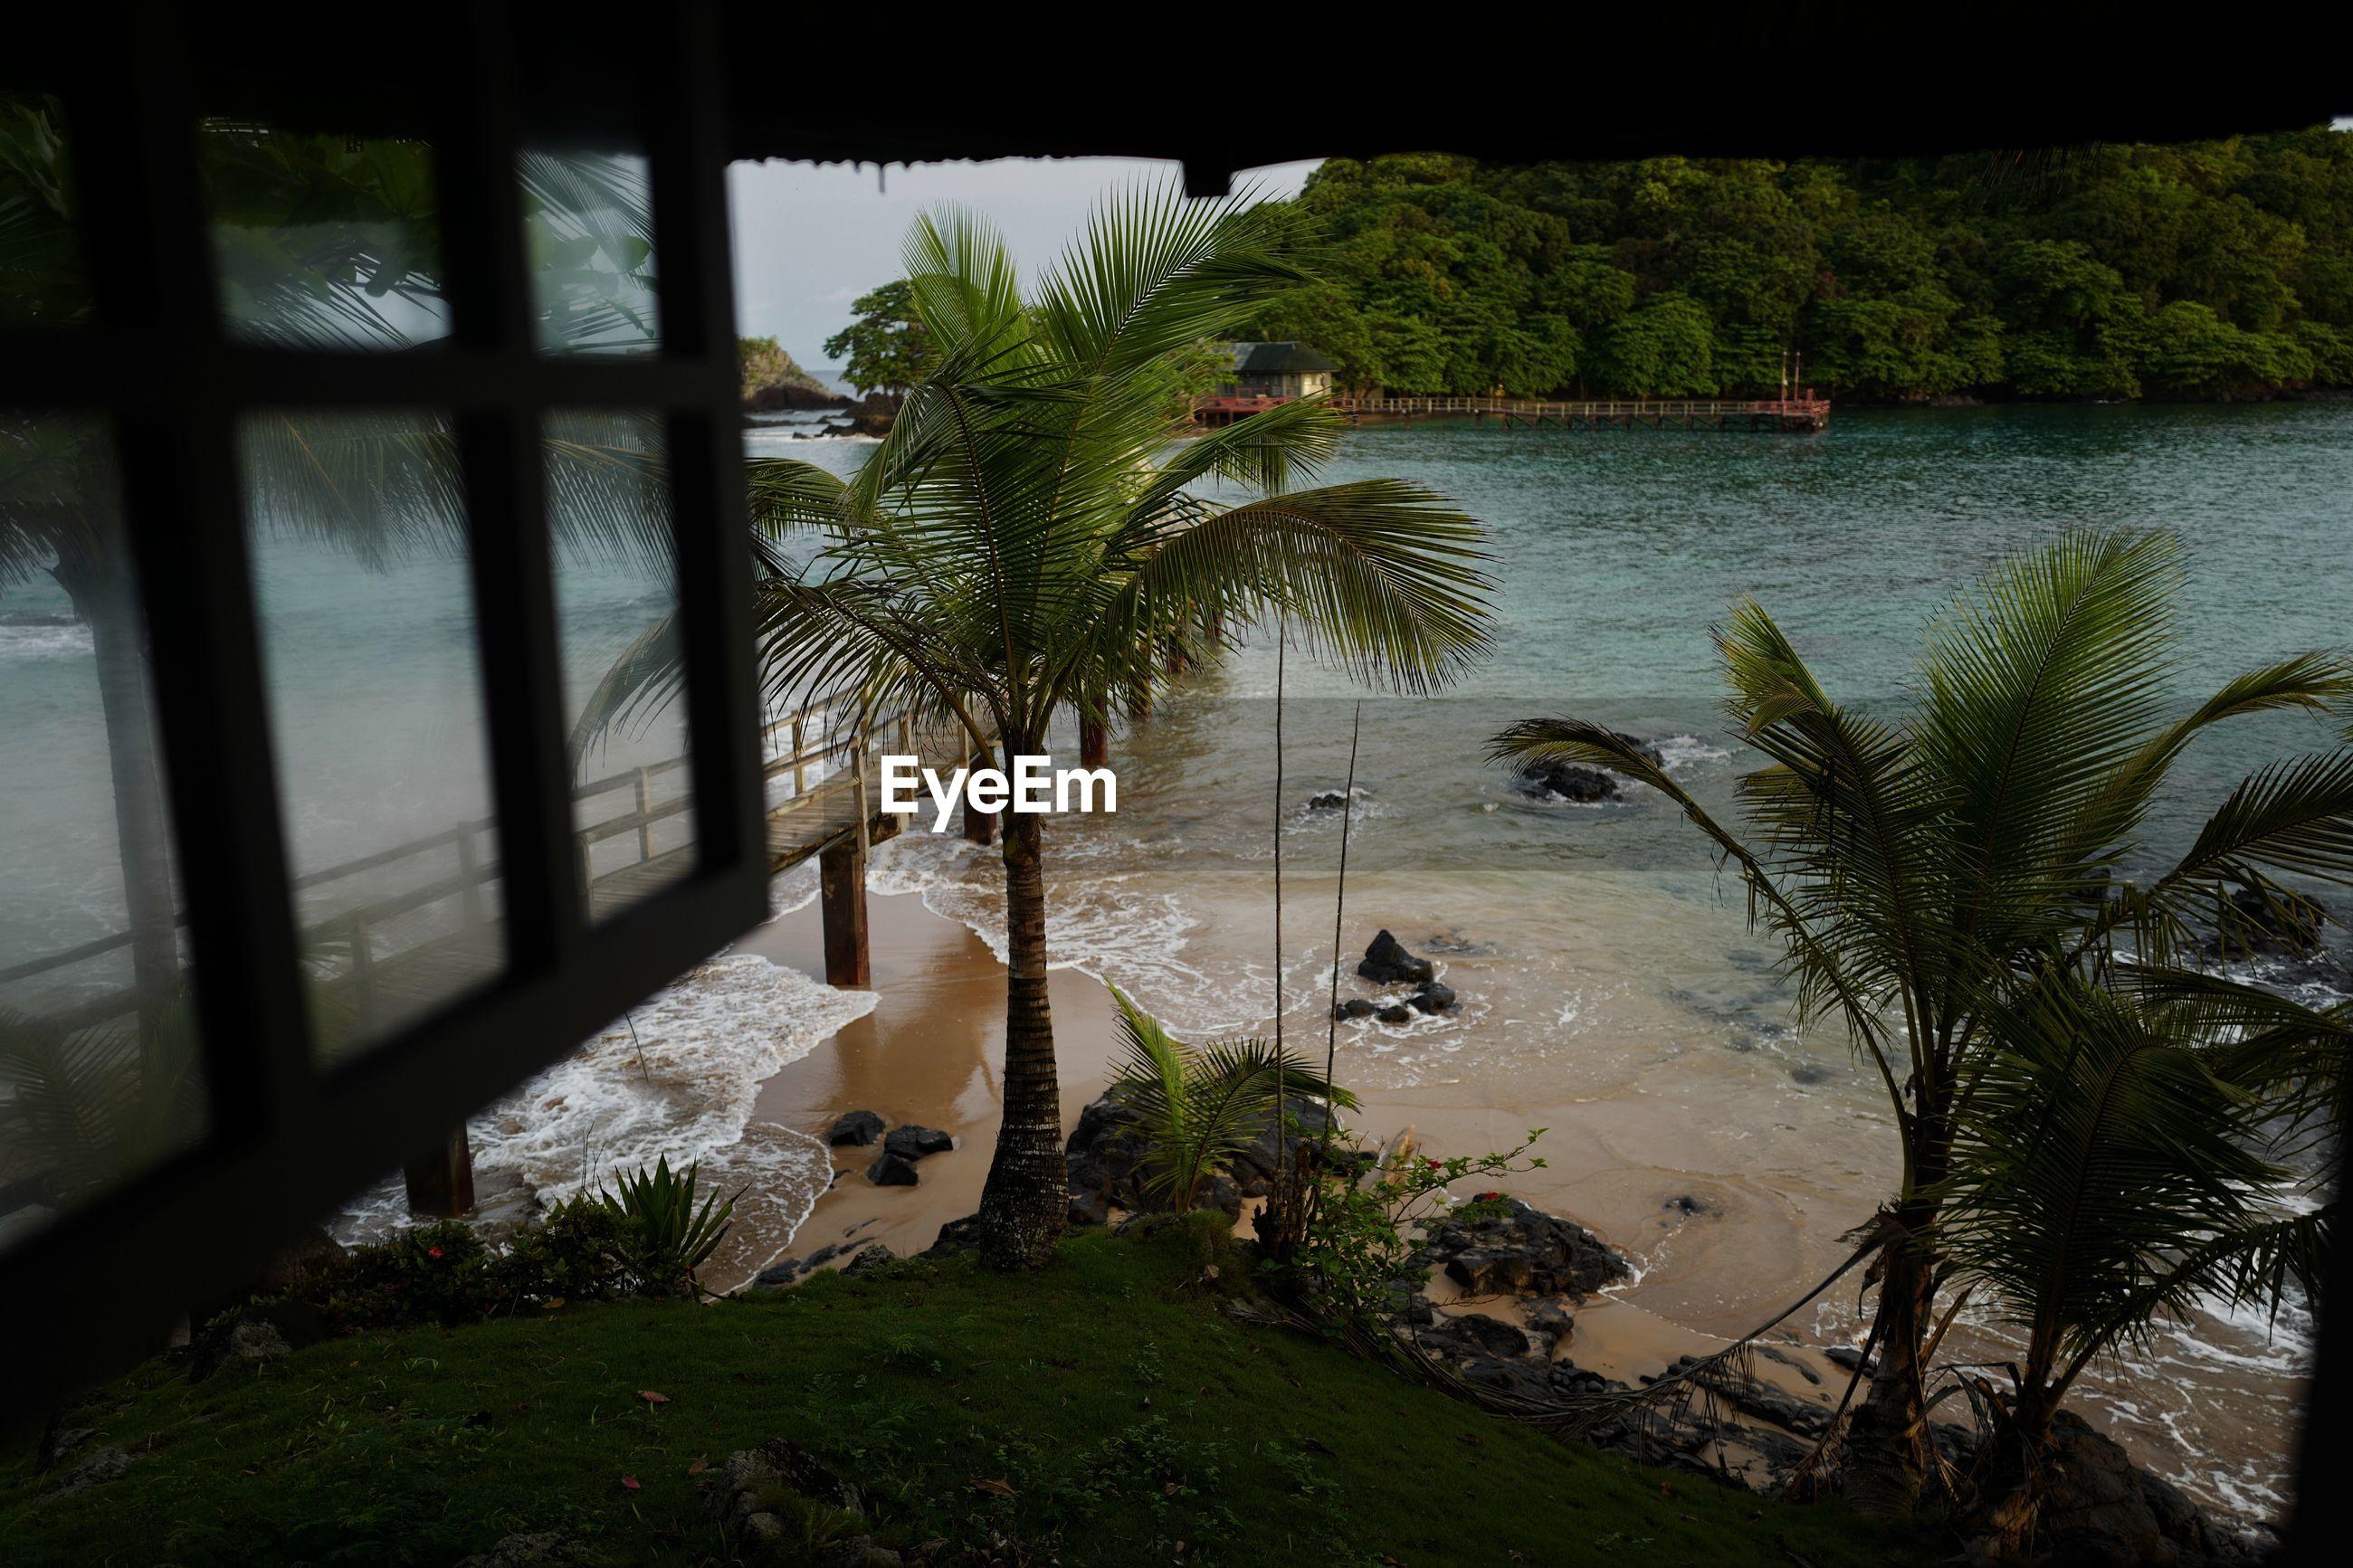 Palm trees at sea shore seen through window